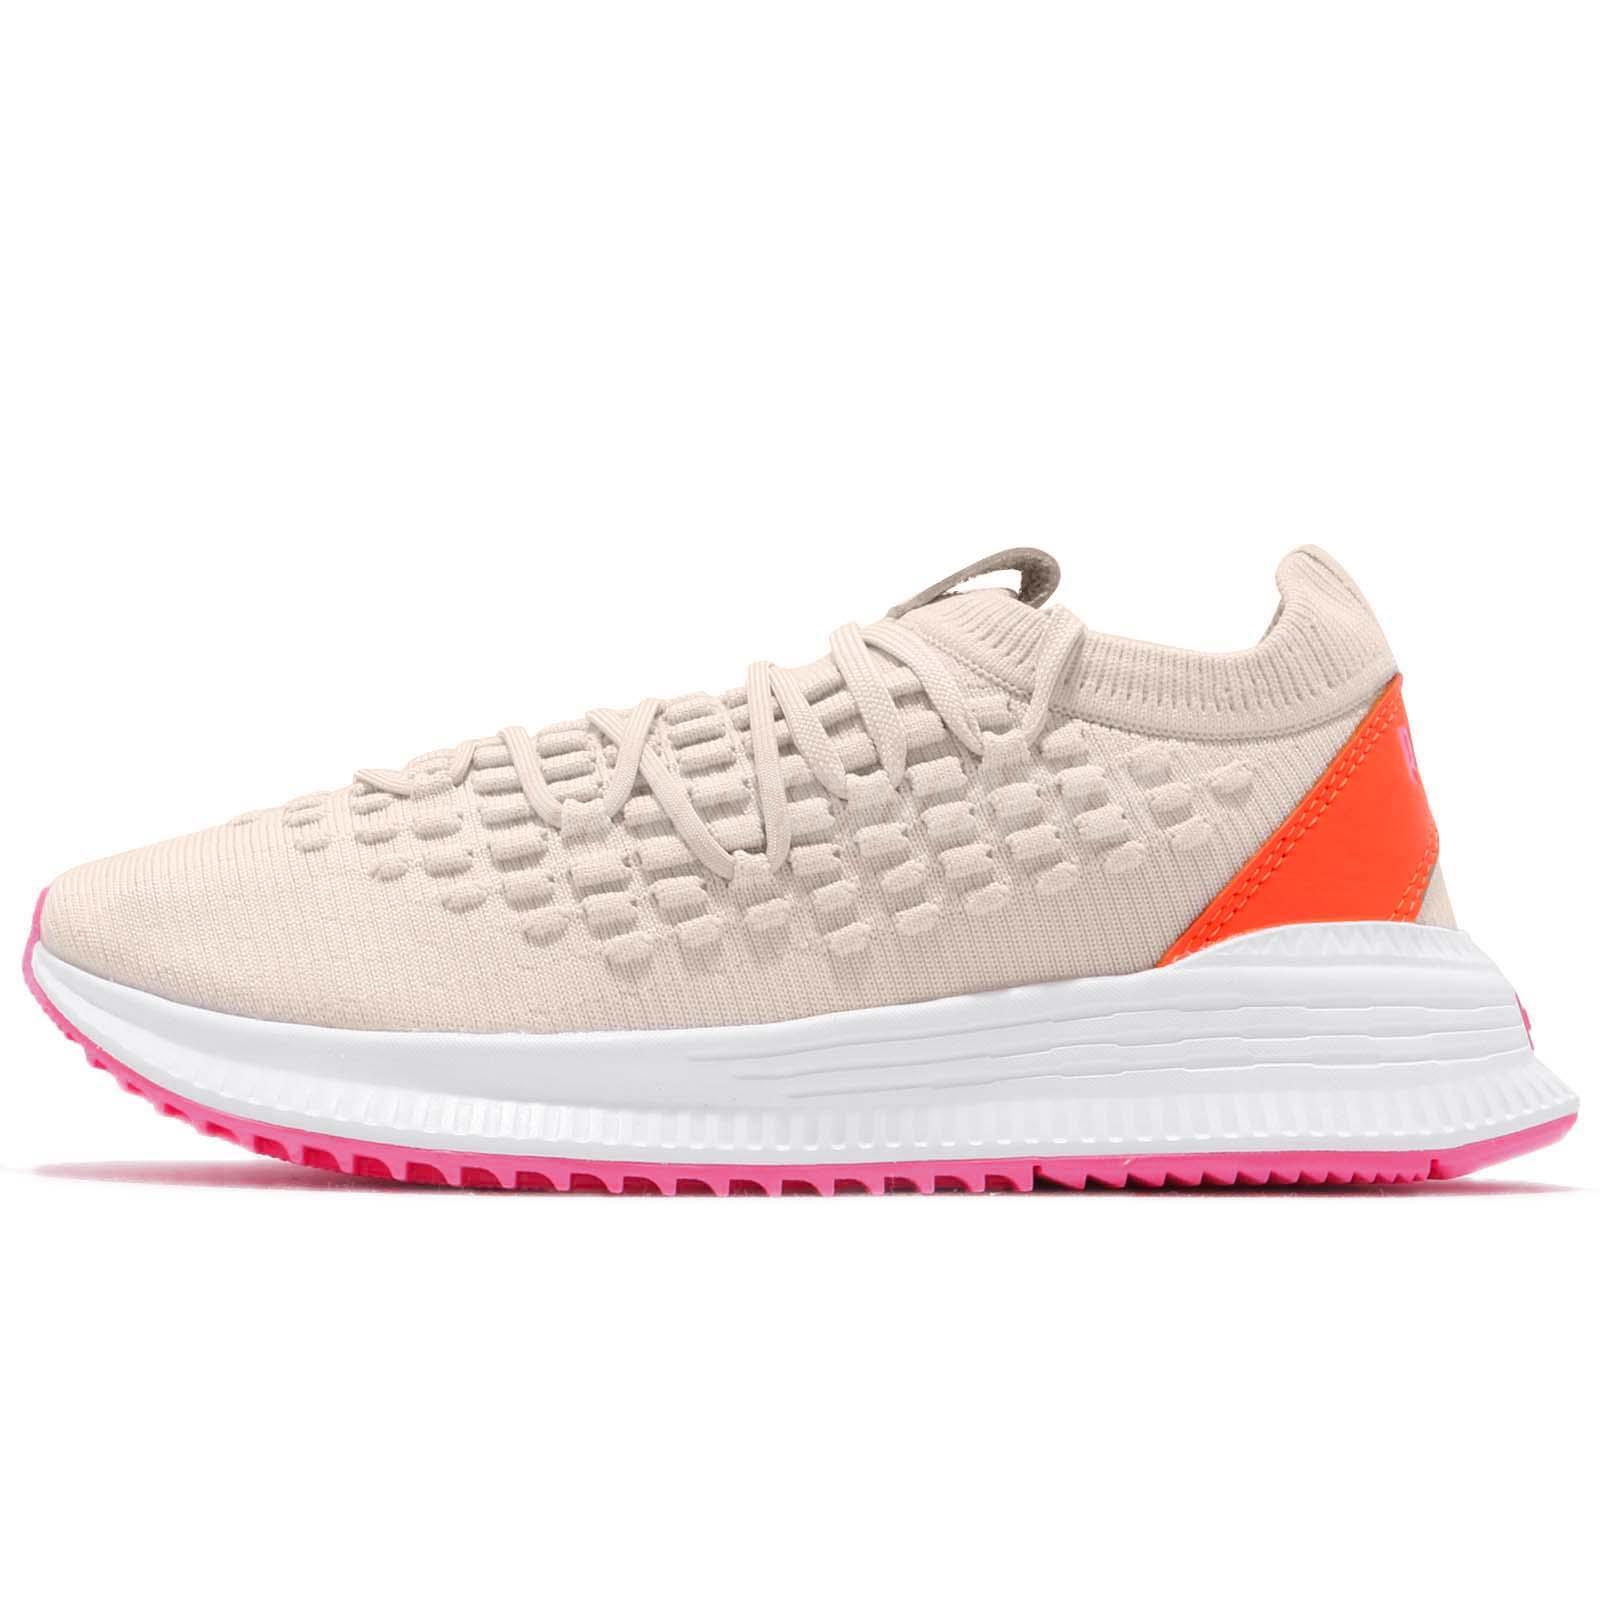 44efd1ef85 Puma AVID Fusefit Birch Orange White Pink Men Women Running Shoes 367242-11